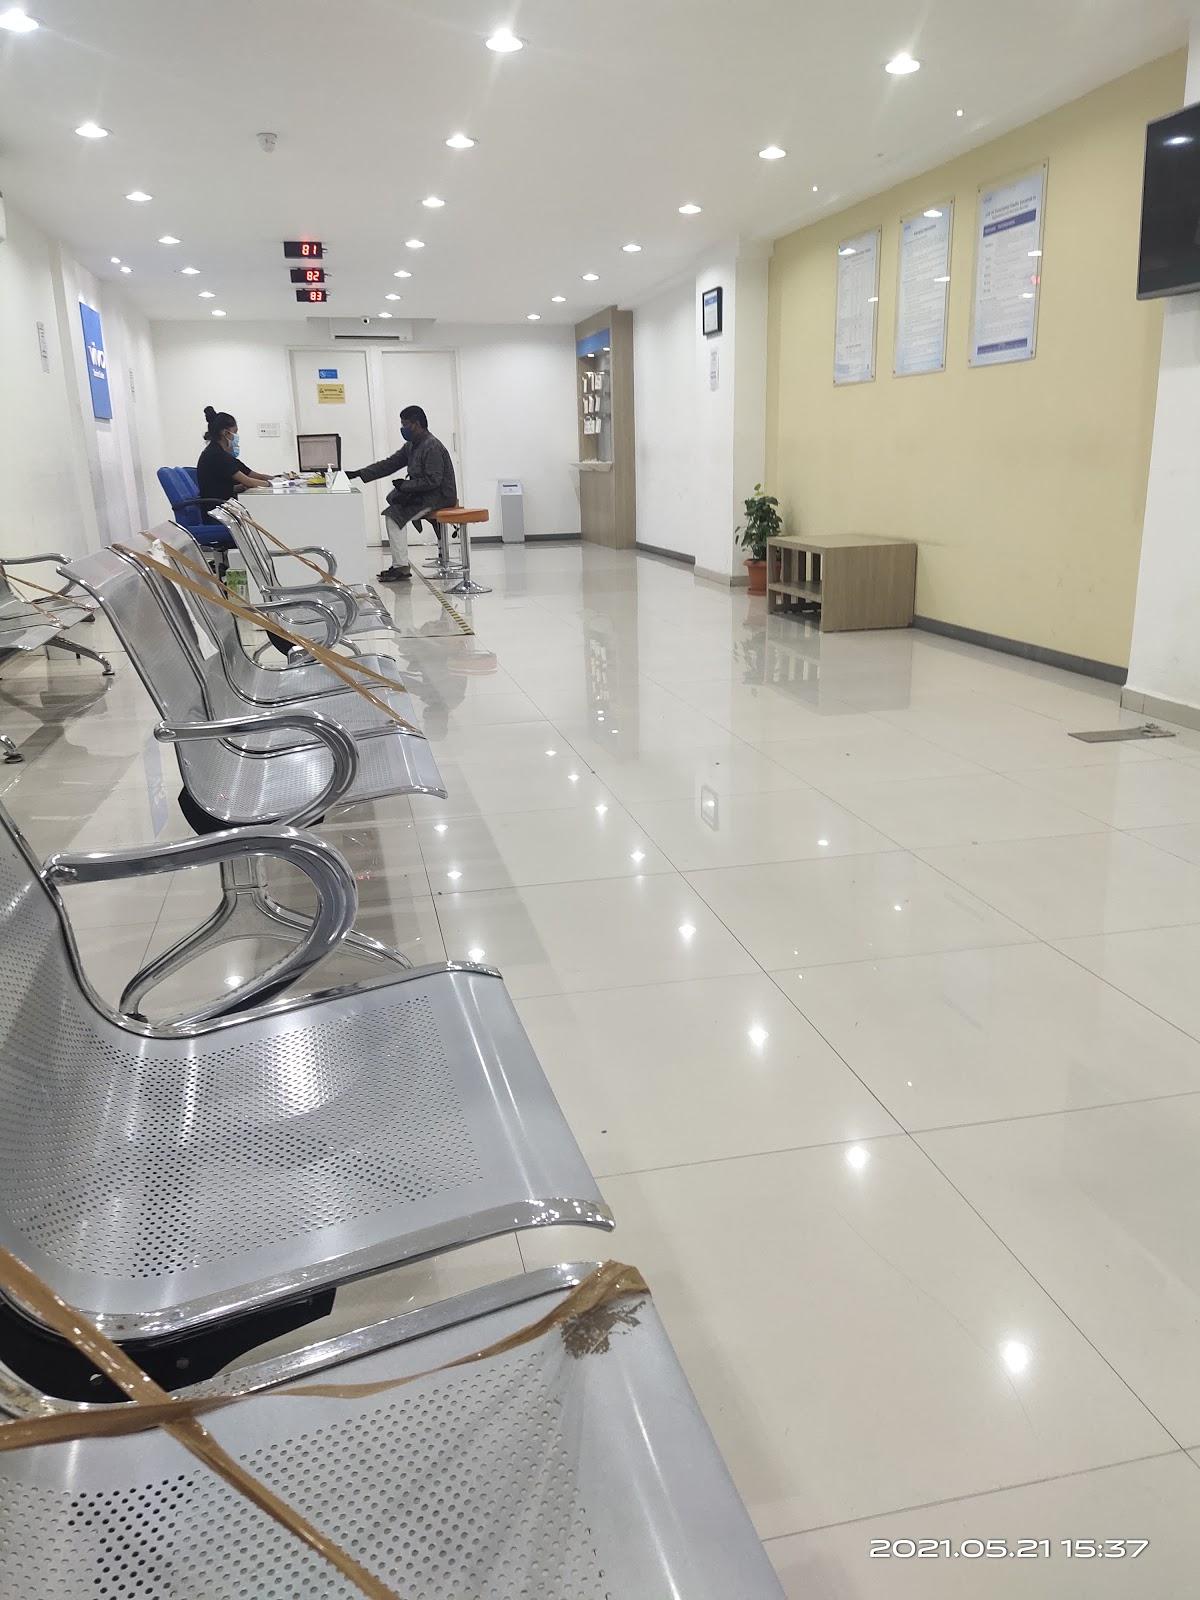 iQOO service center